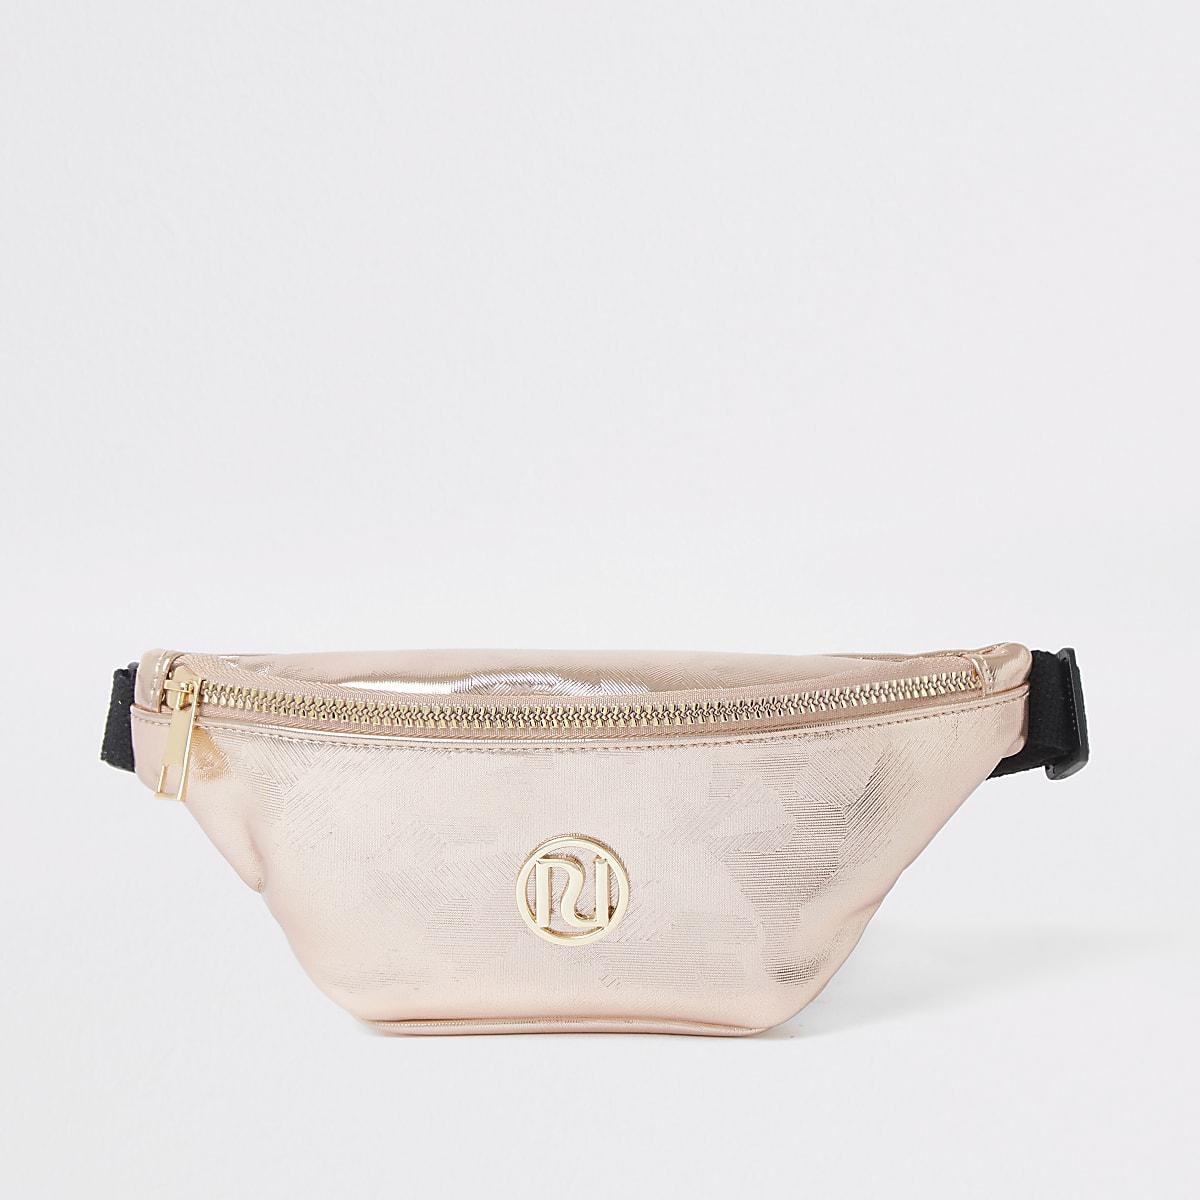 Girls rose gold bum bag